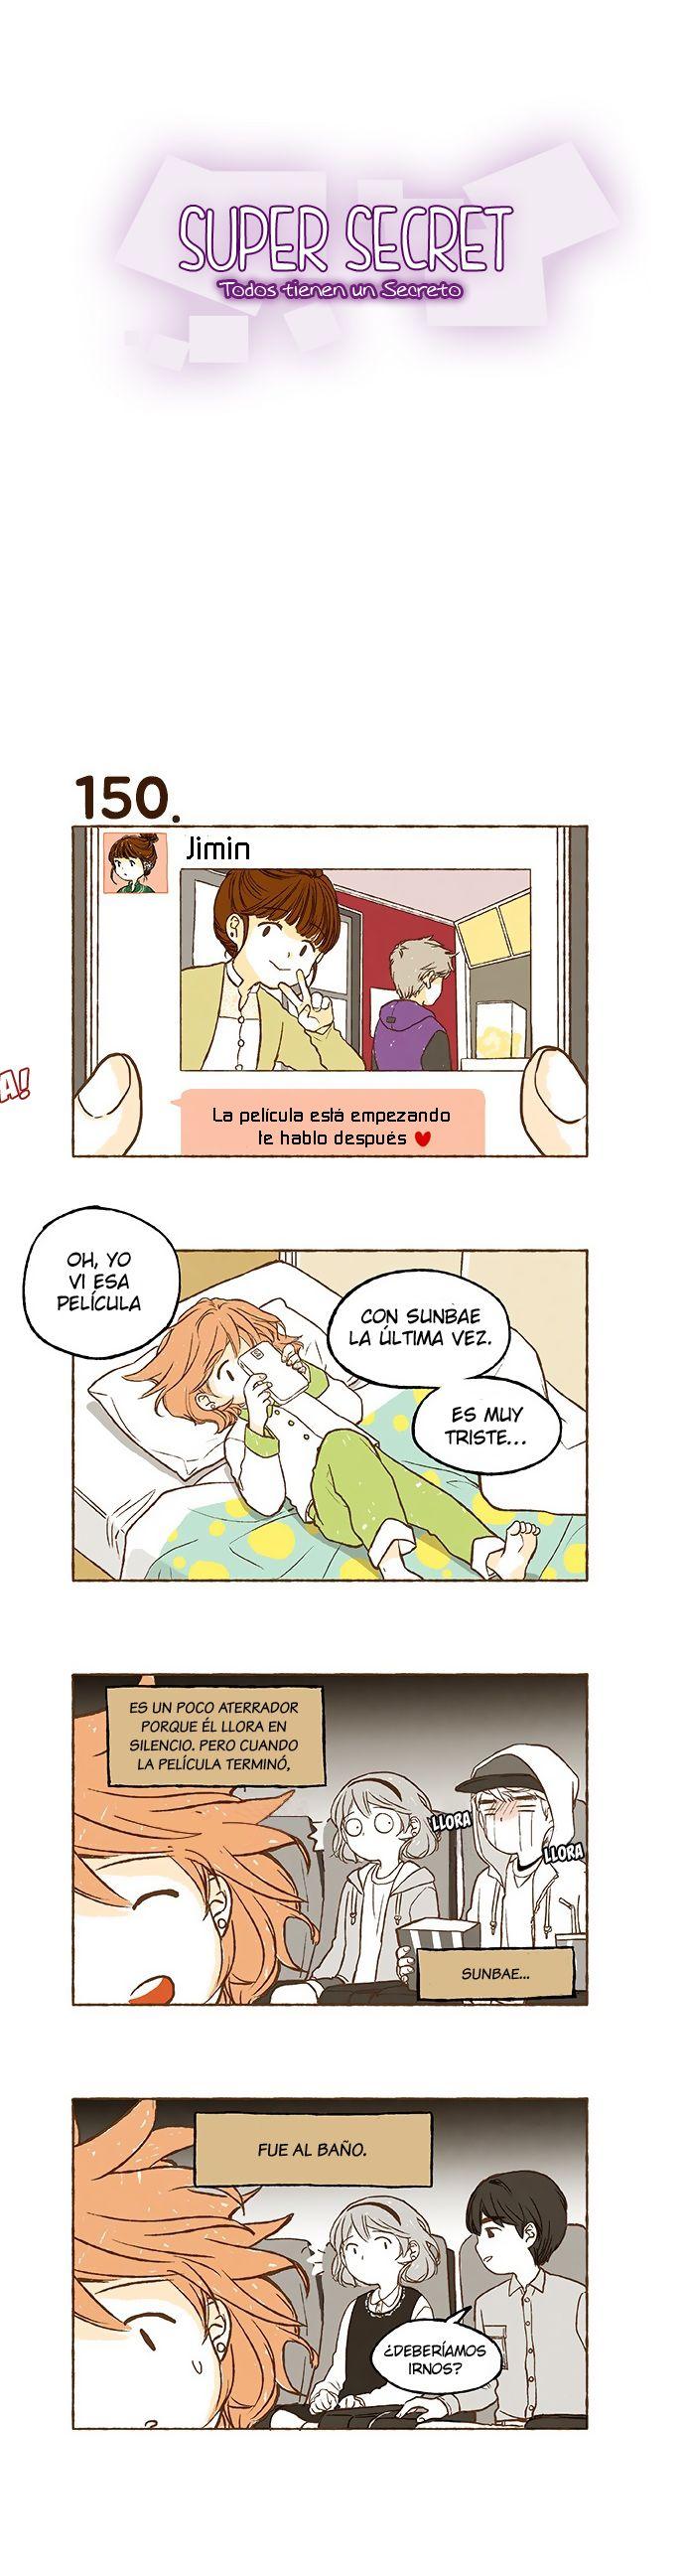 http://c5.ninemanga.com/es_manga/pic2/61/17725/494019/3a24e72cfa0b739f8c5b15a0caa24191.jpg Page 2